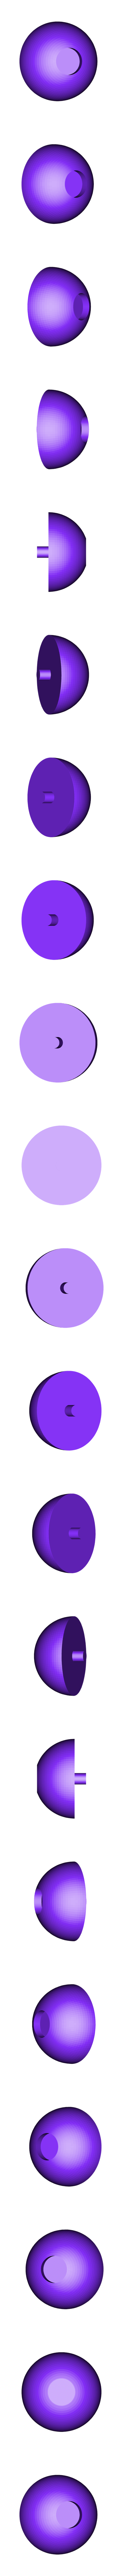 Eye_Ball_Large_A.stl Download free STL file Halloween Glow in the dark wall/door hanger (Skelton) • 3D print object, Pongo